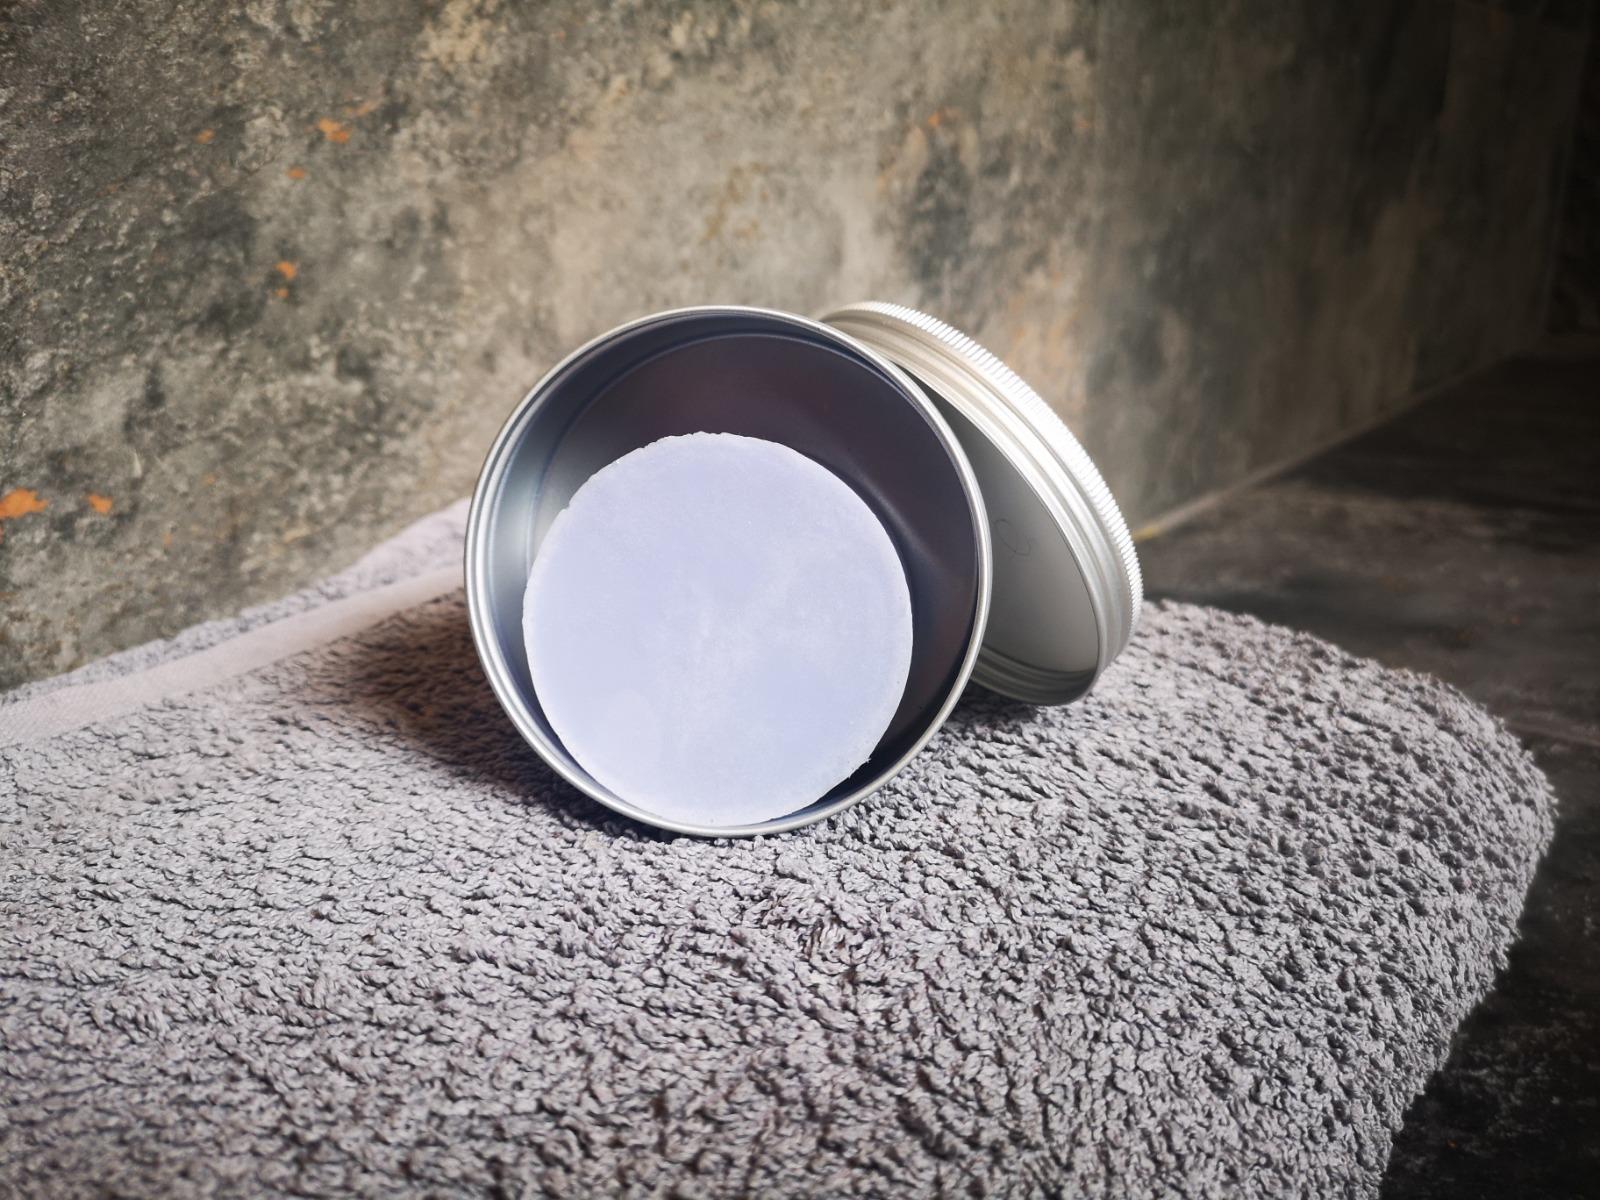 Geranium & Lavender Shampoo Bar Image